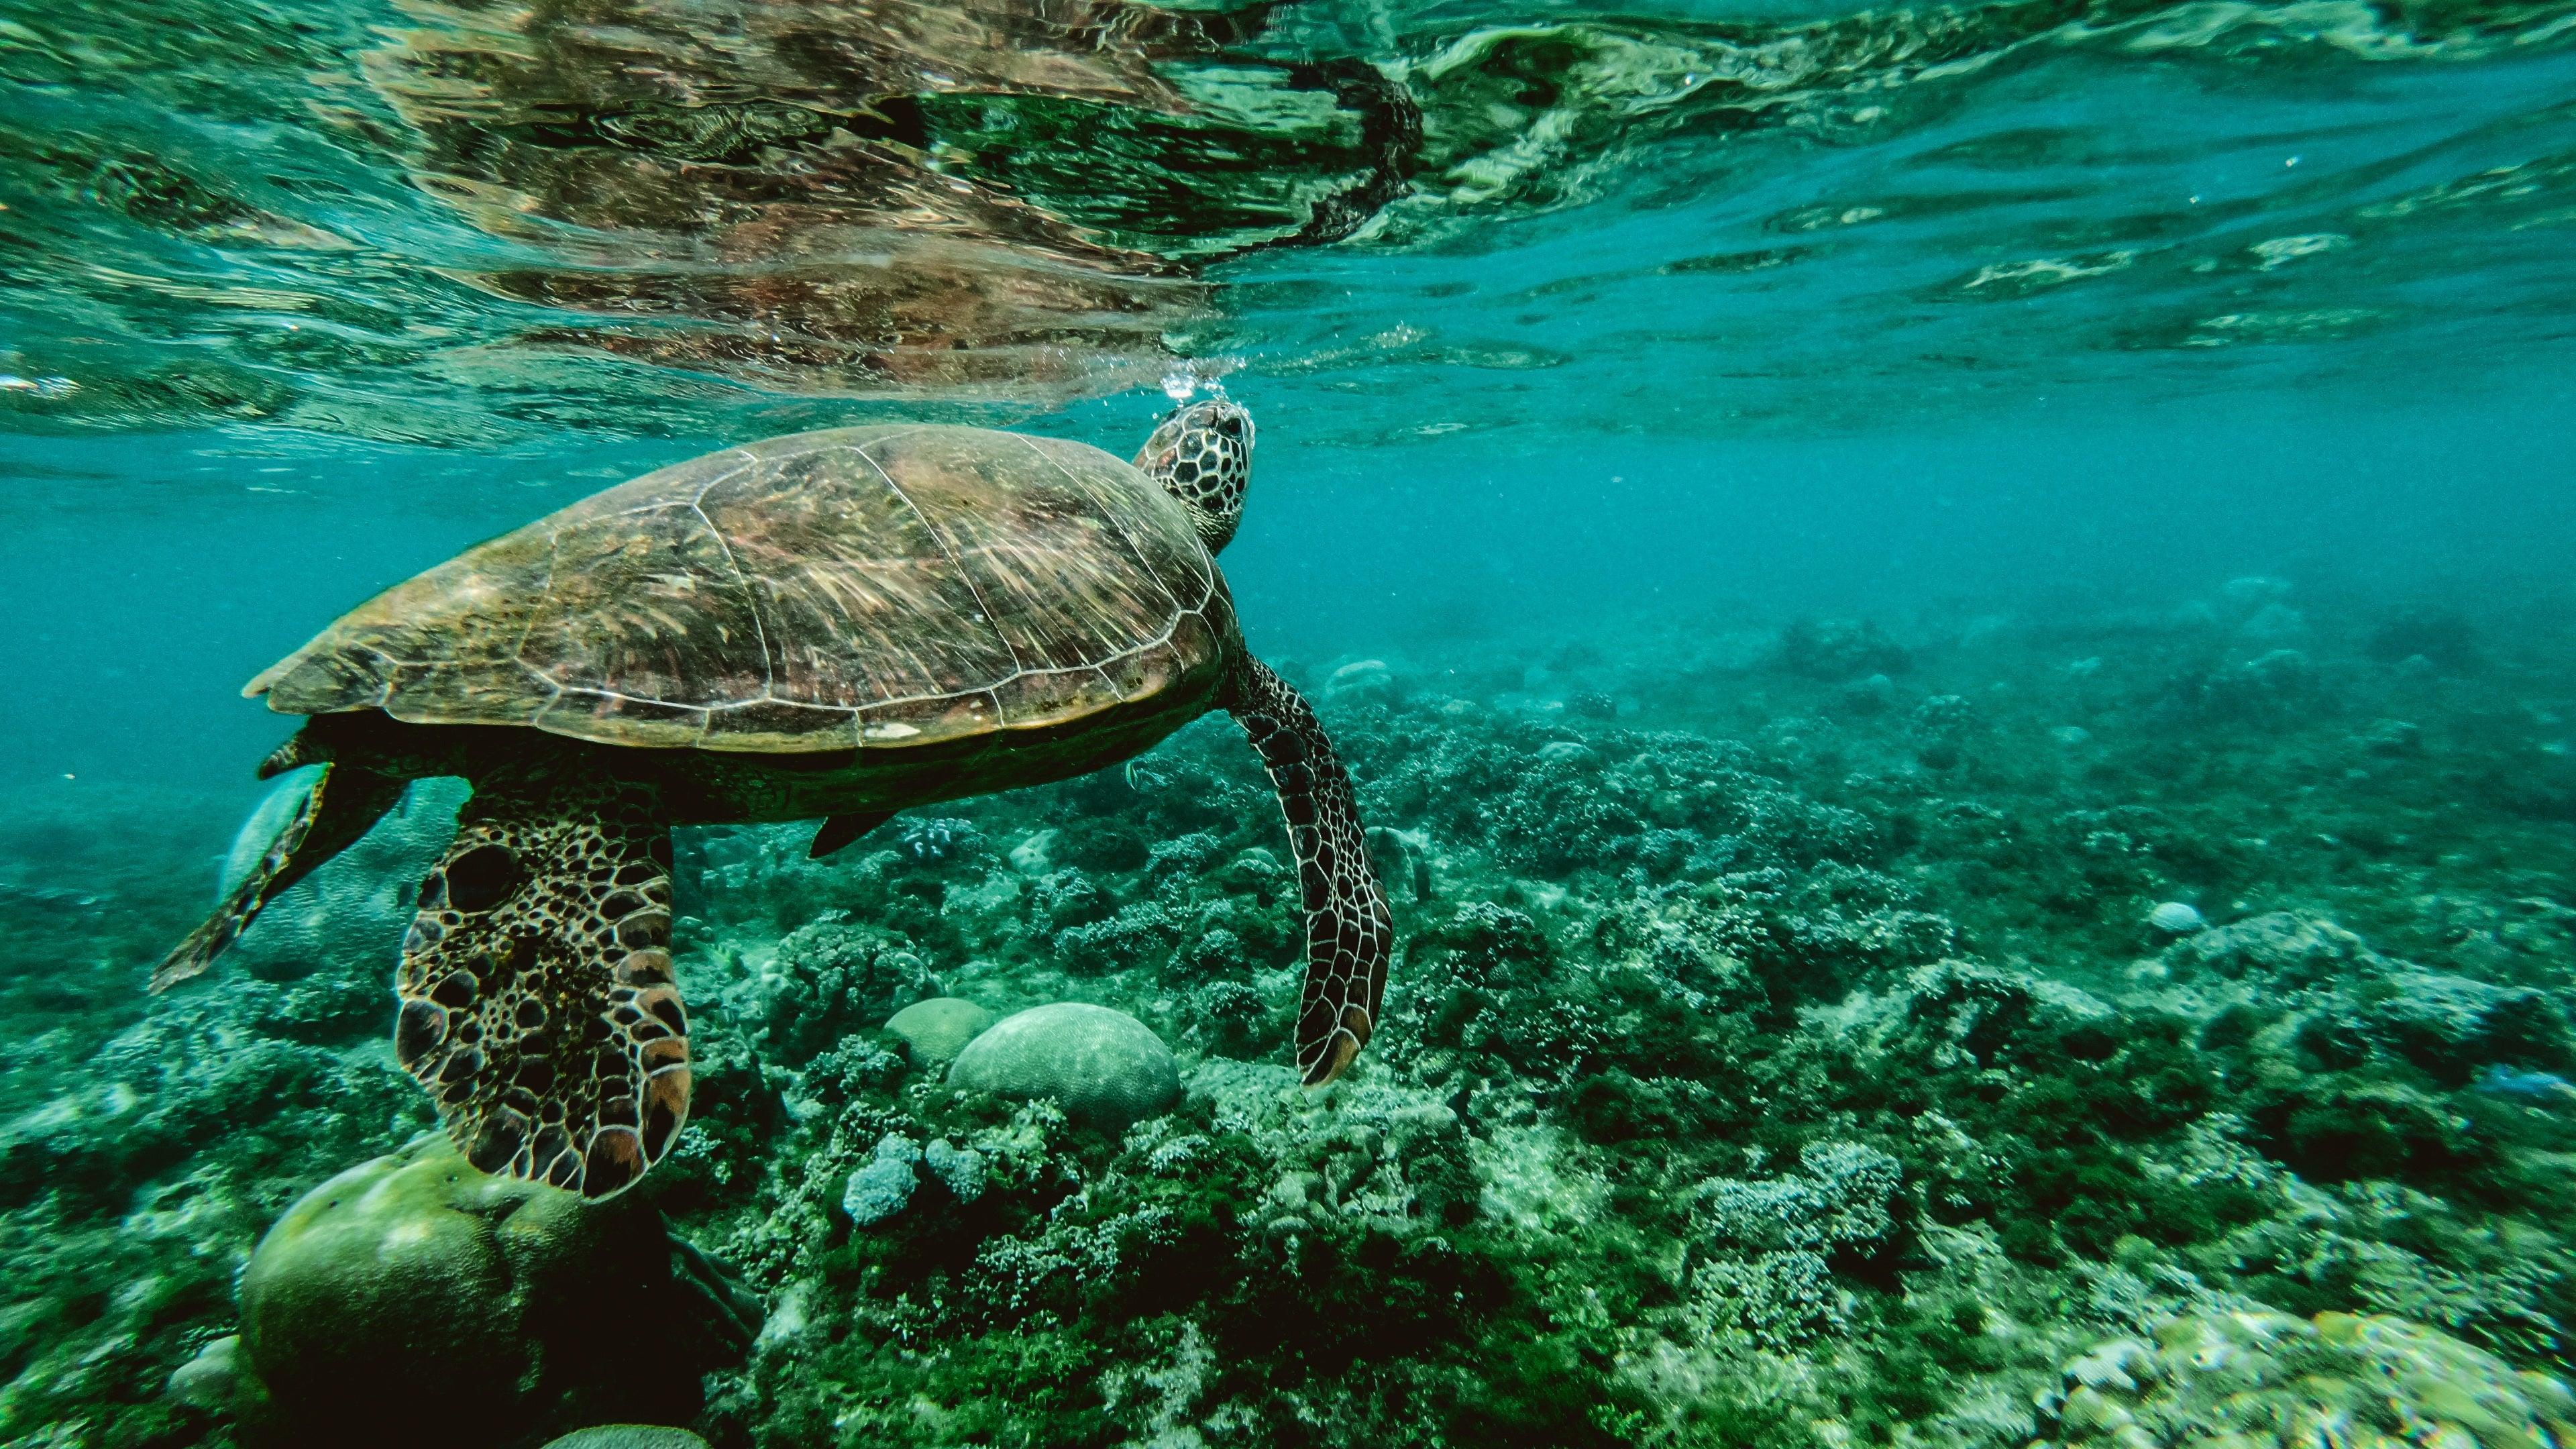 k turtle underwater k  wallpaper